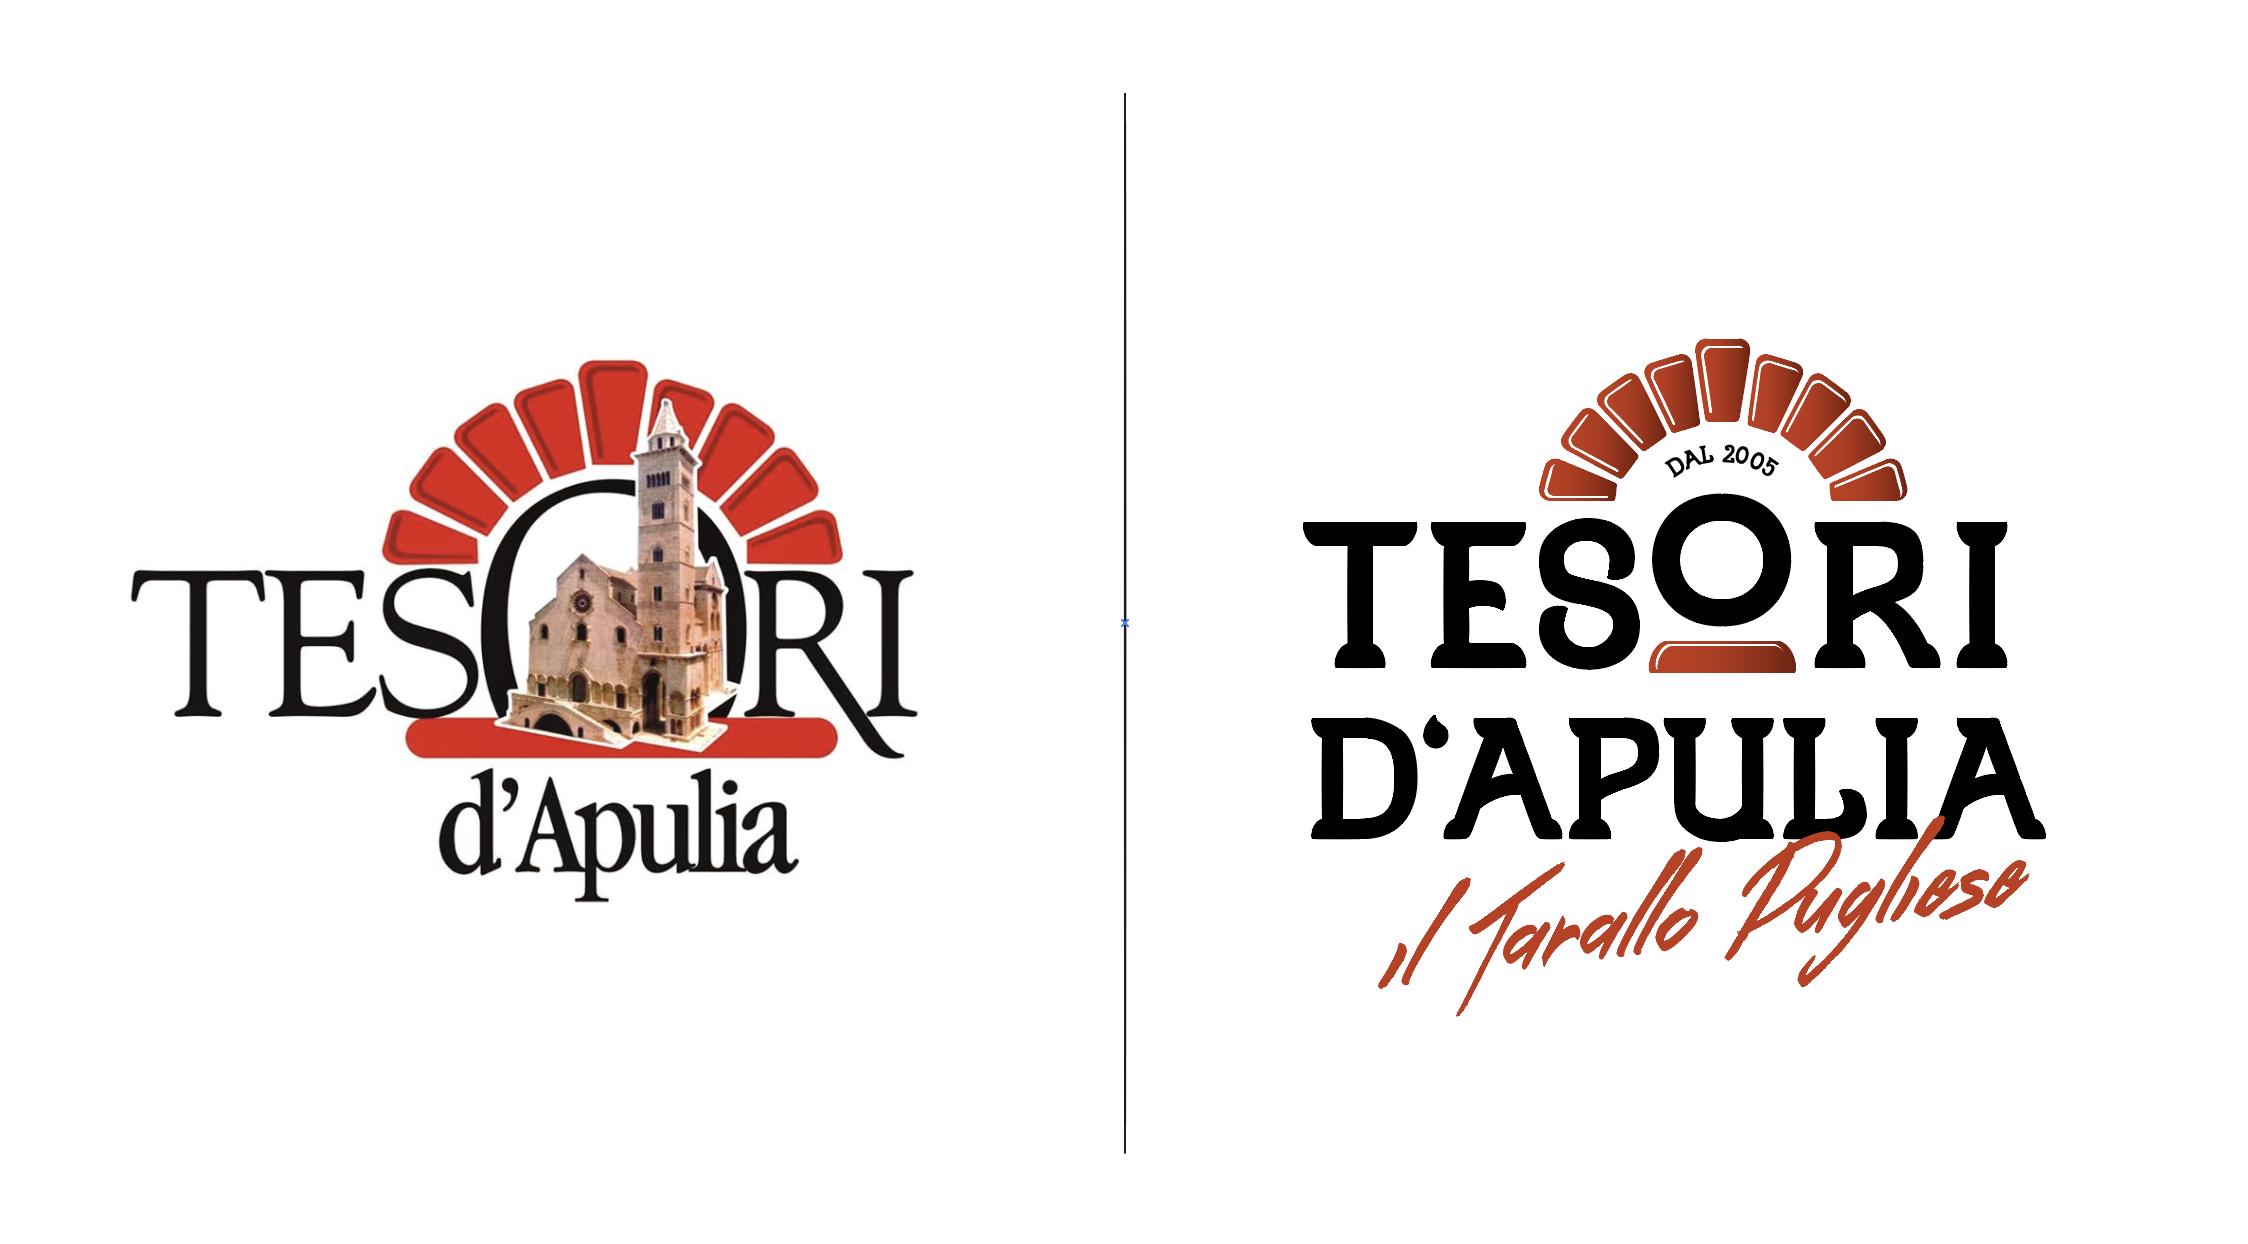 Tesori D'Apulia